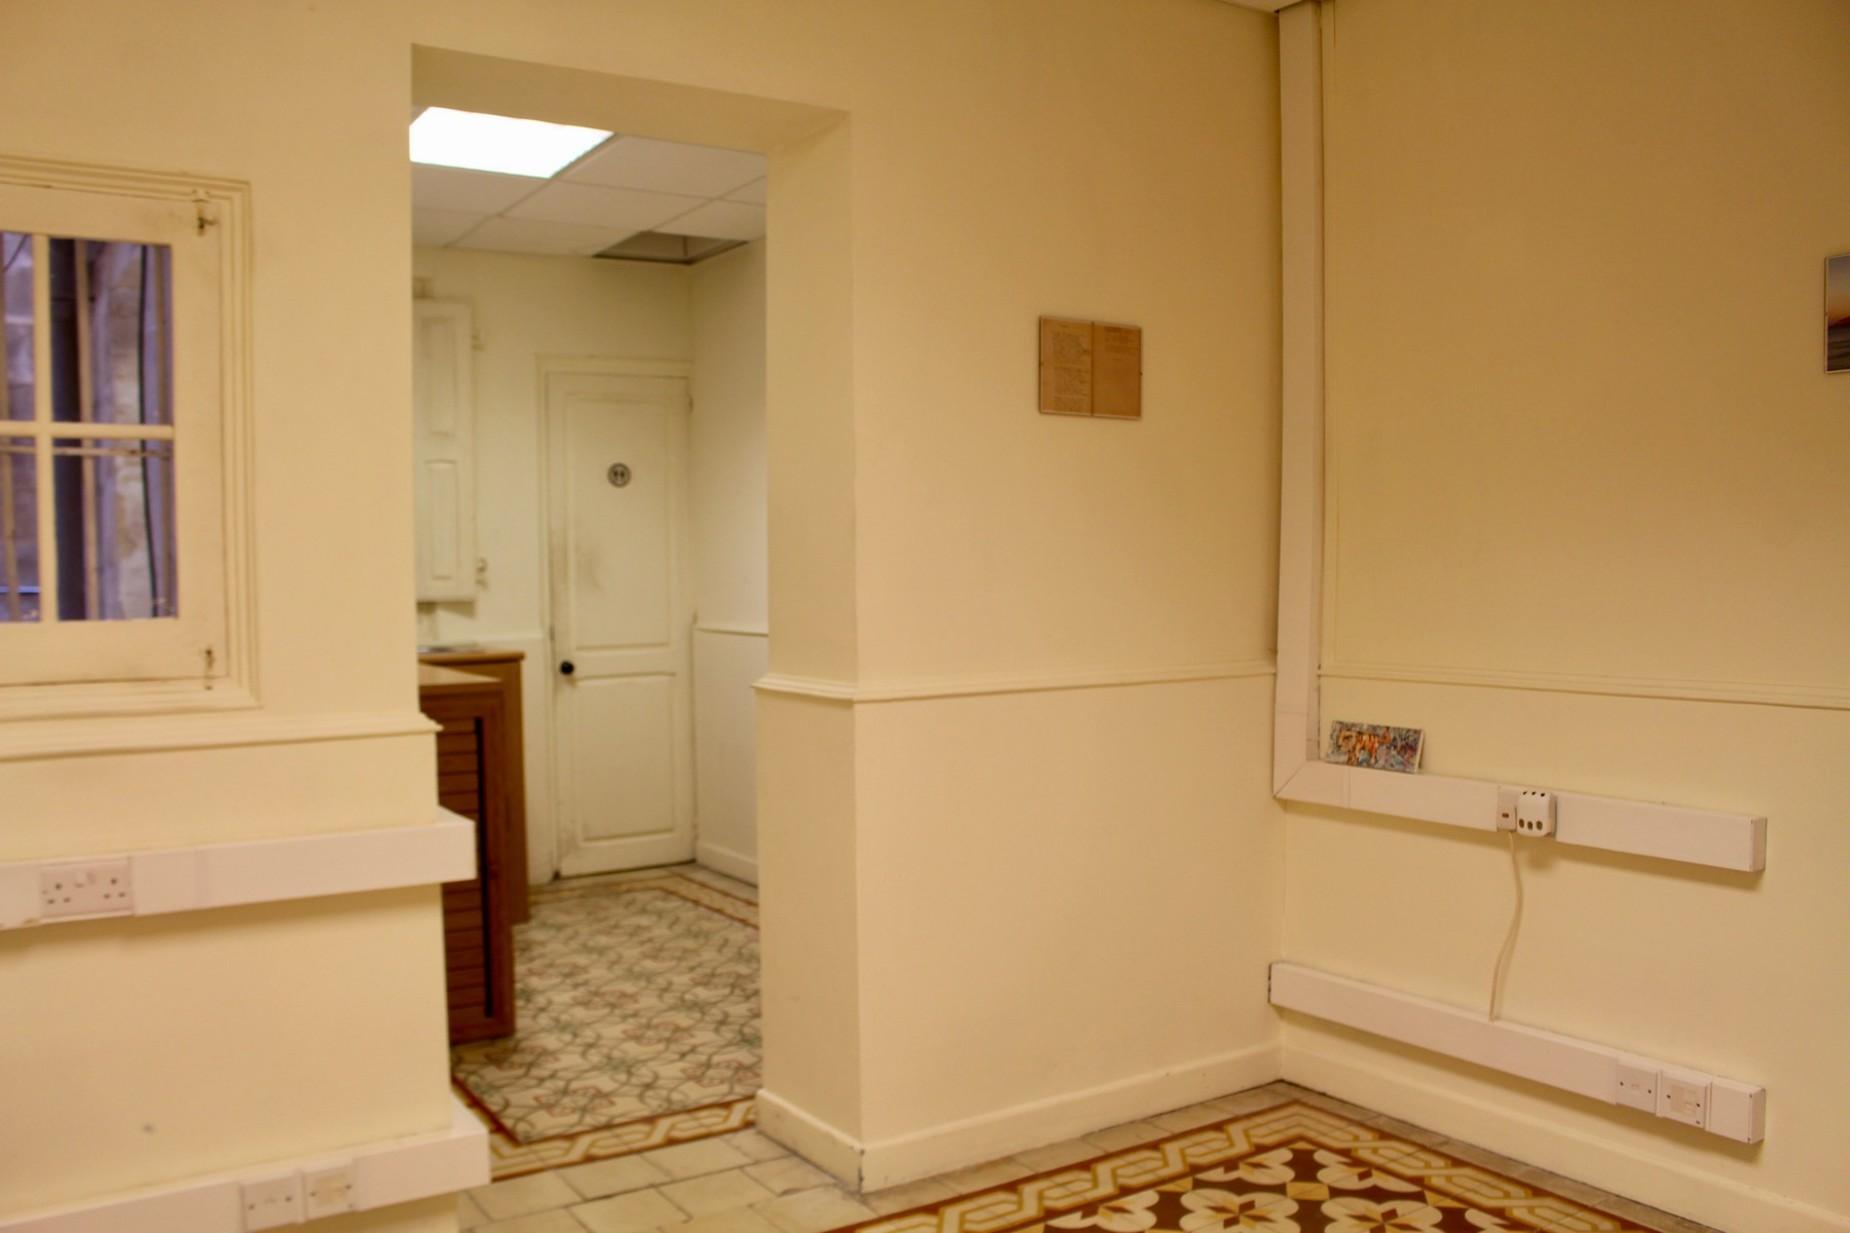 0 bed Office For Rent in Valletta, Valletta - thumb 5